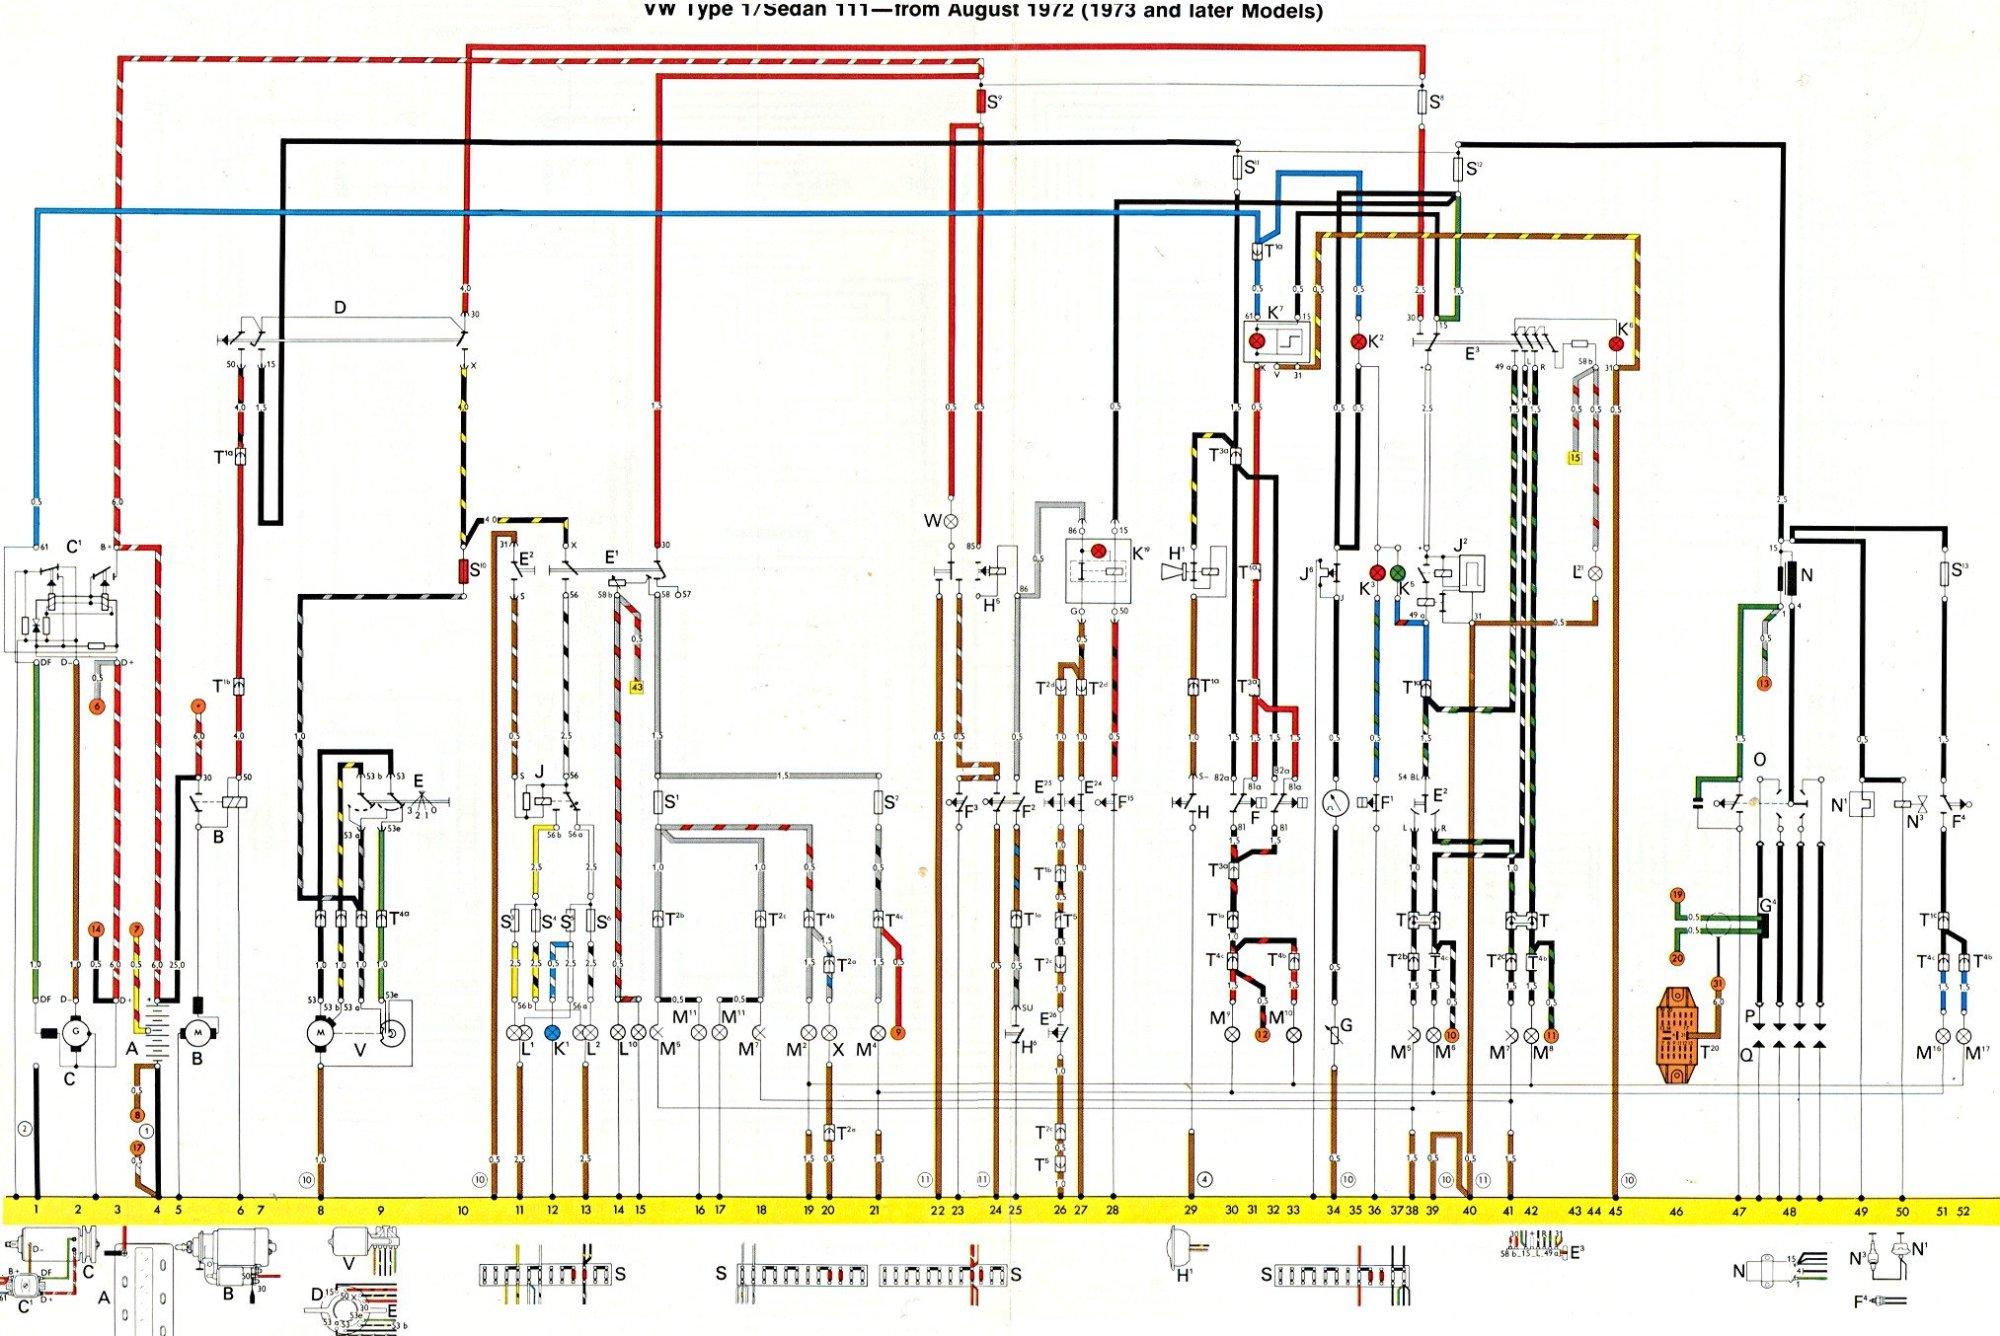 hight resolution of volkswagen up wiring diagram wiring diagram img vw up wiring diagram volkswagen up wiring diagram wiring